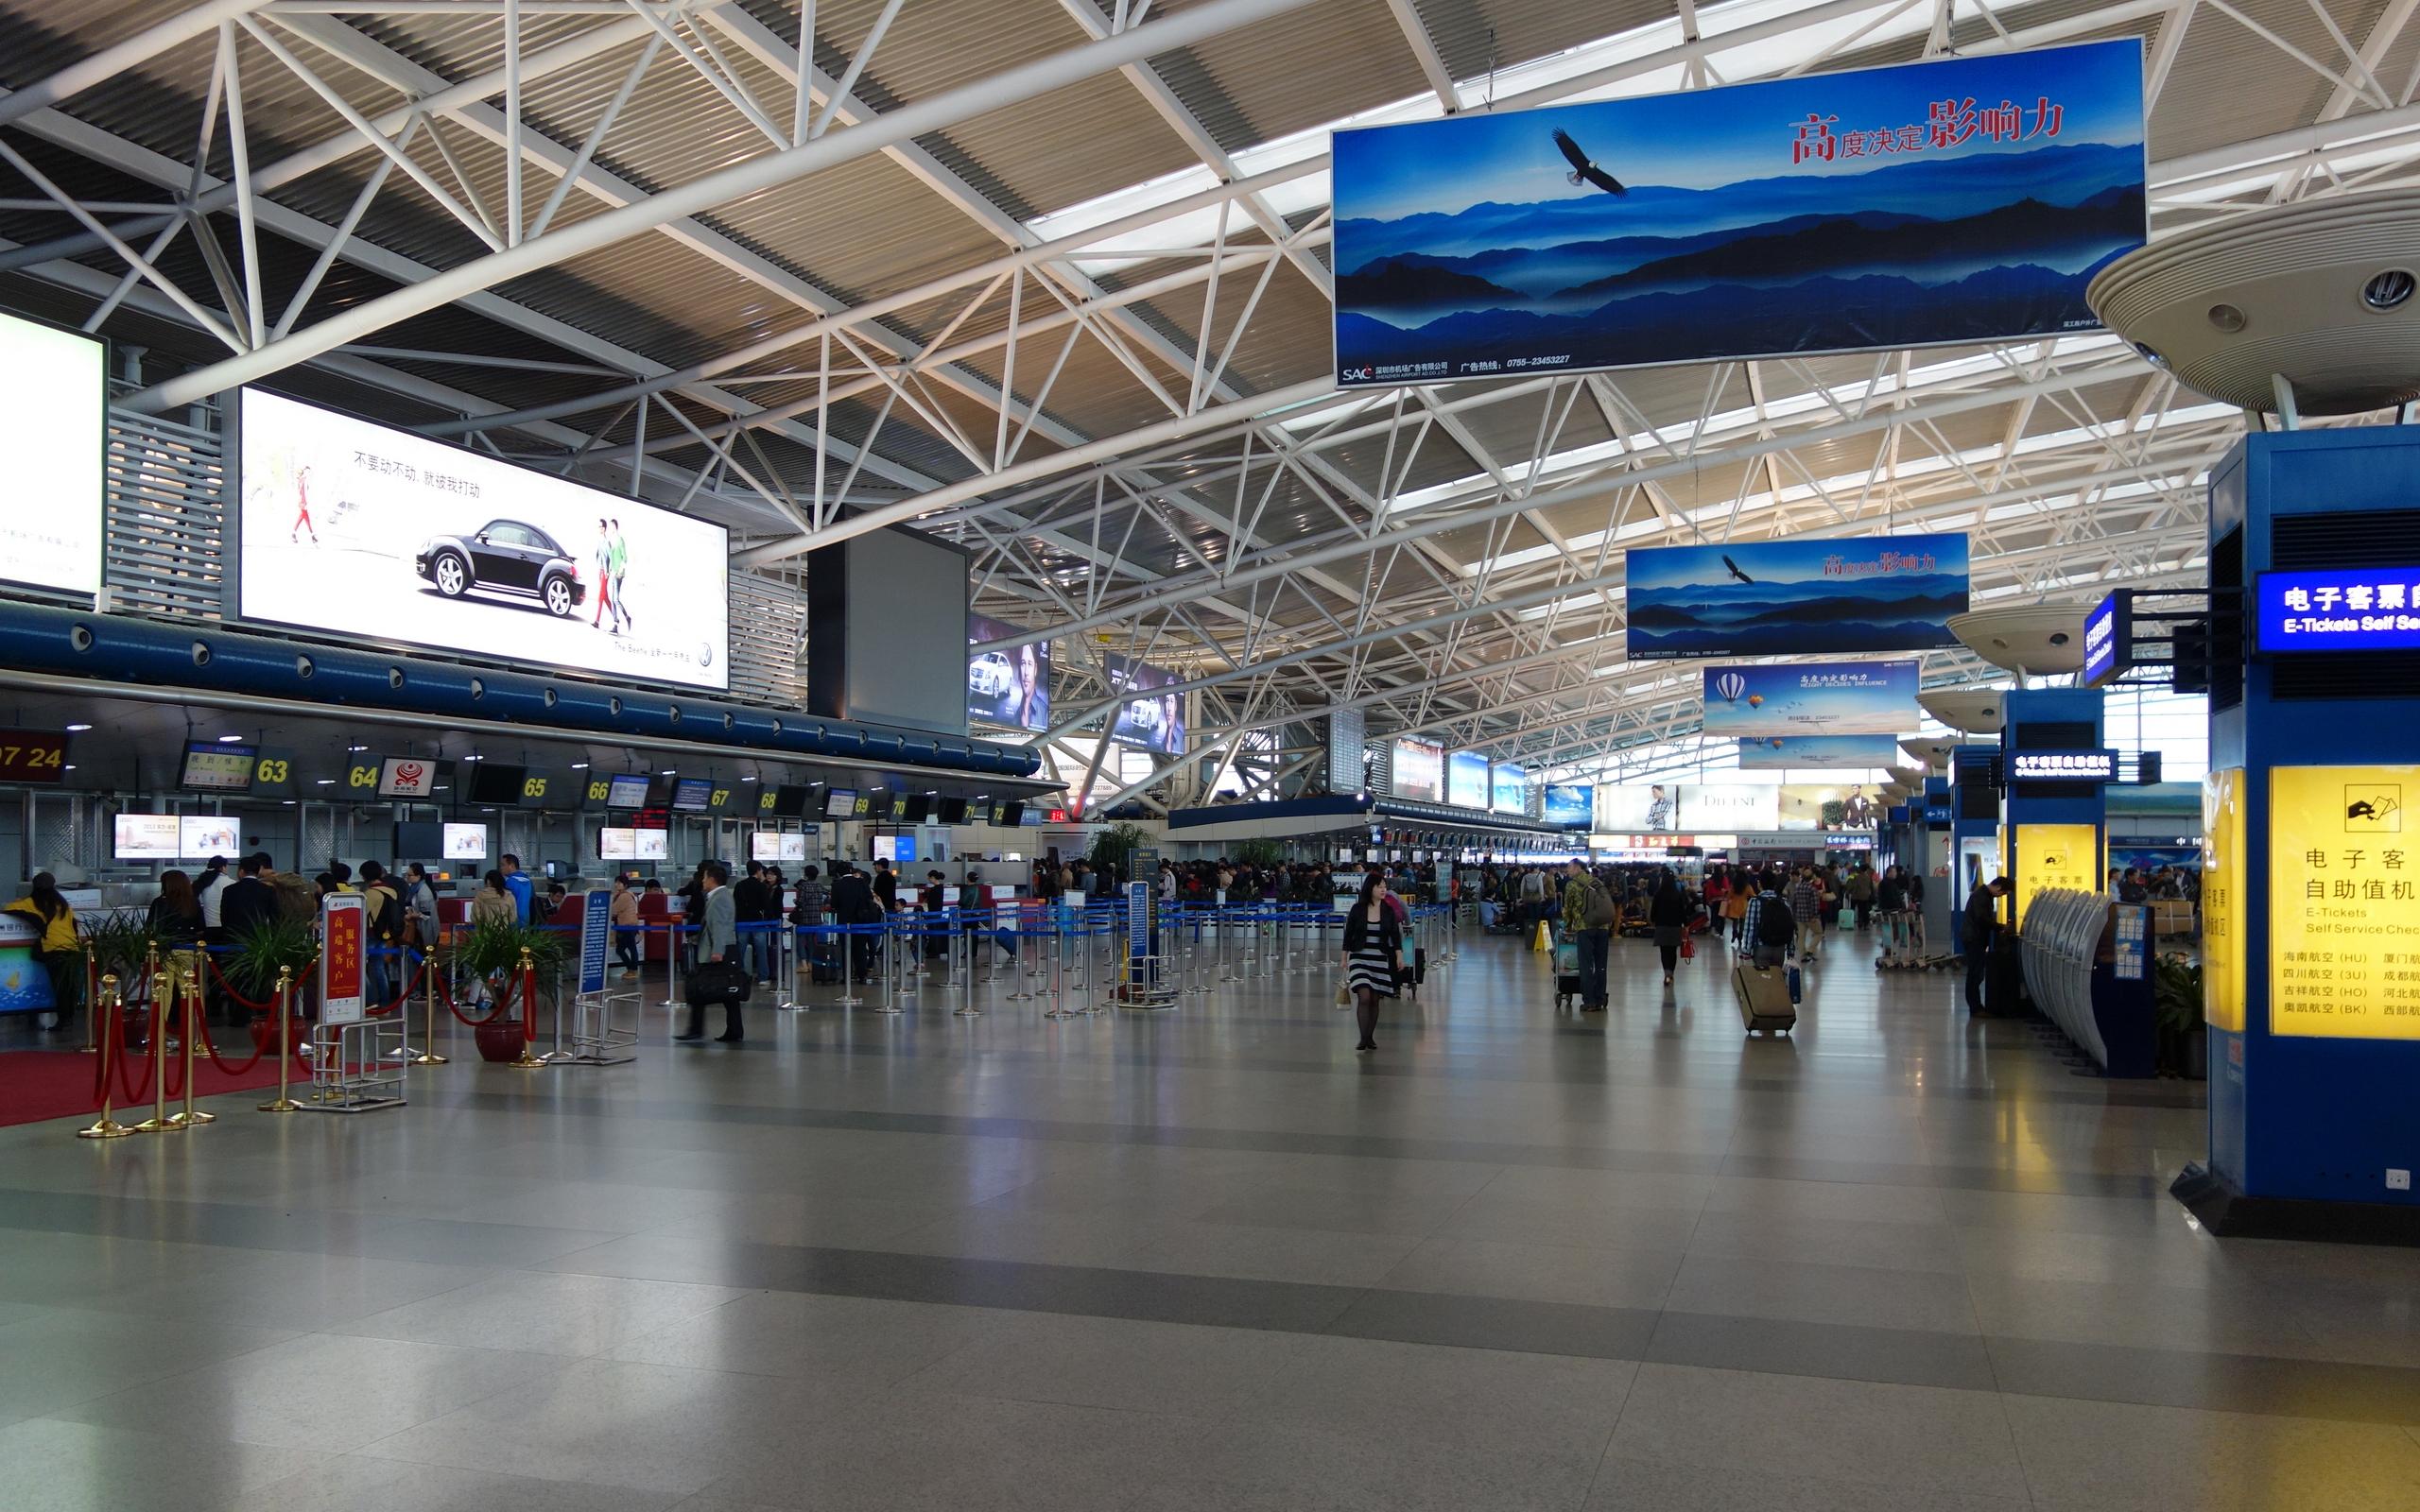 深圳寶安國際機場 - Wikiwand